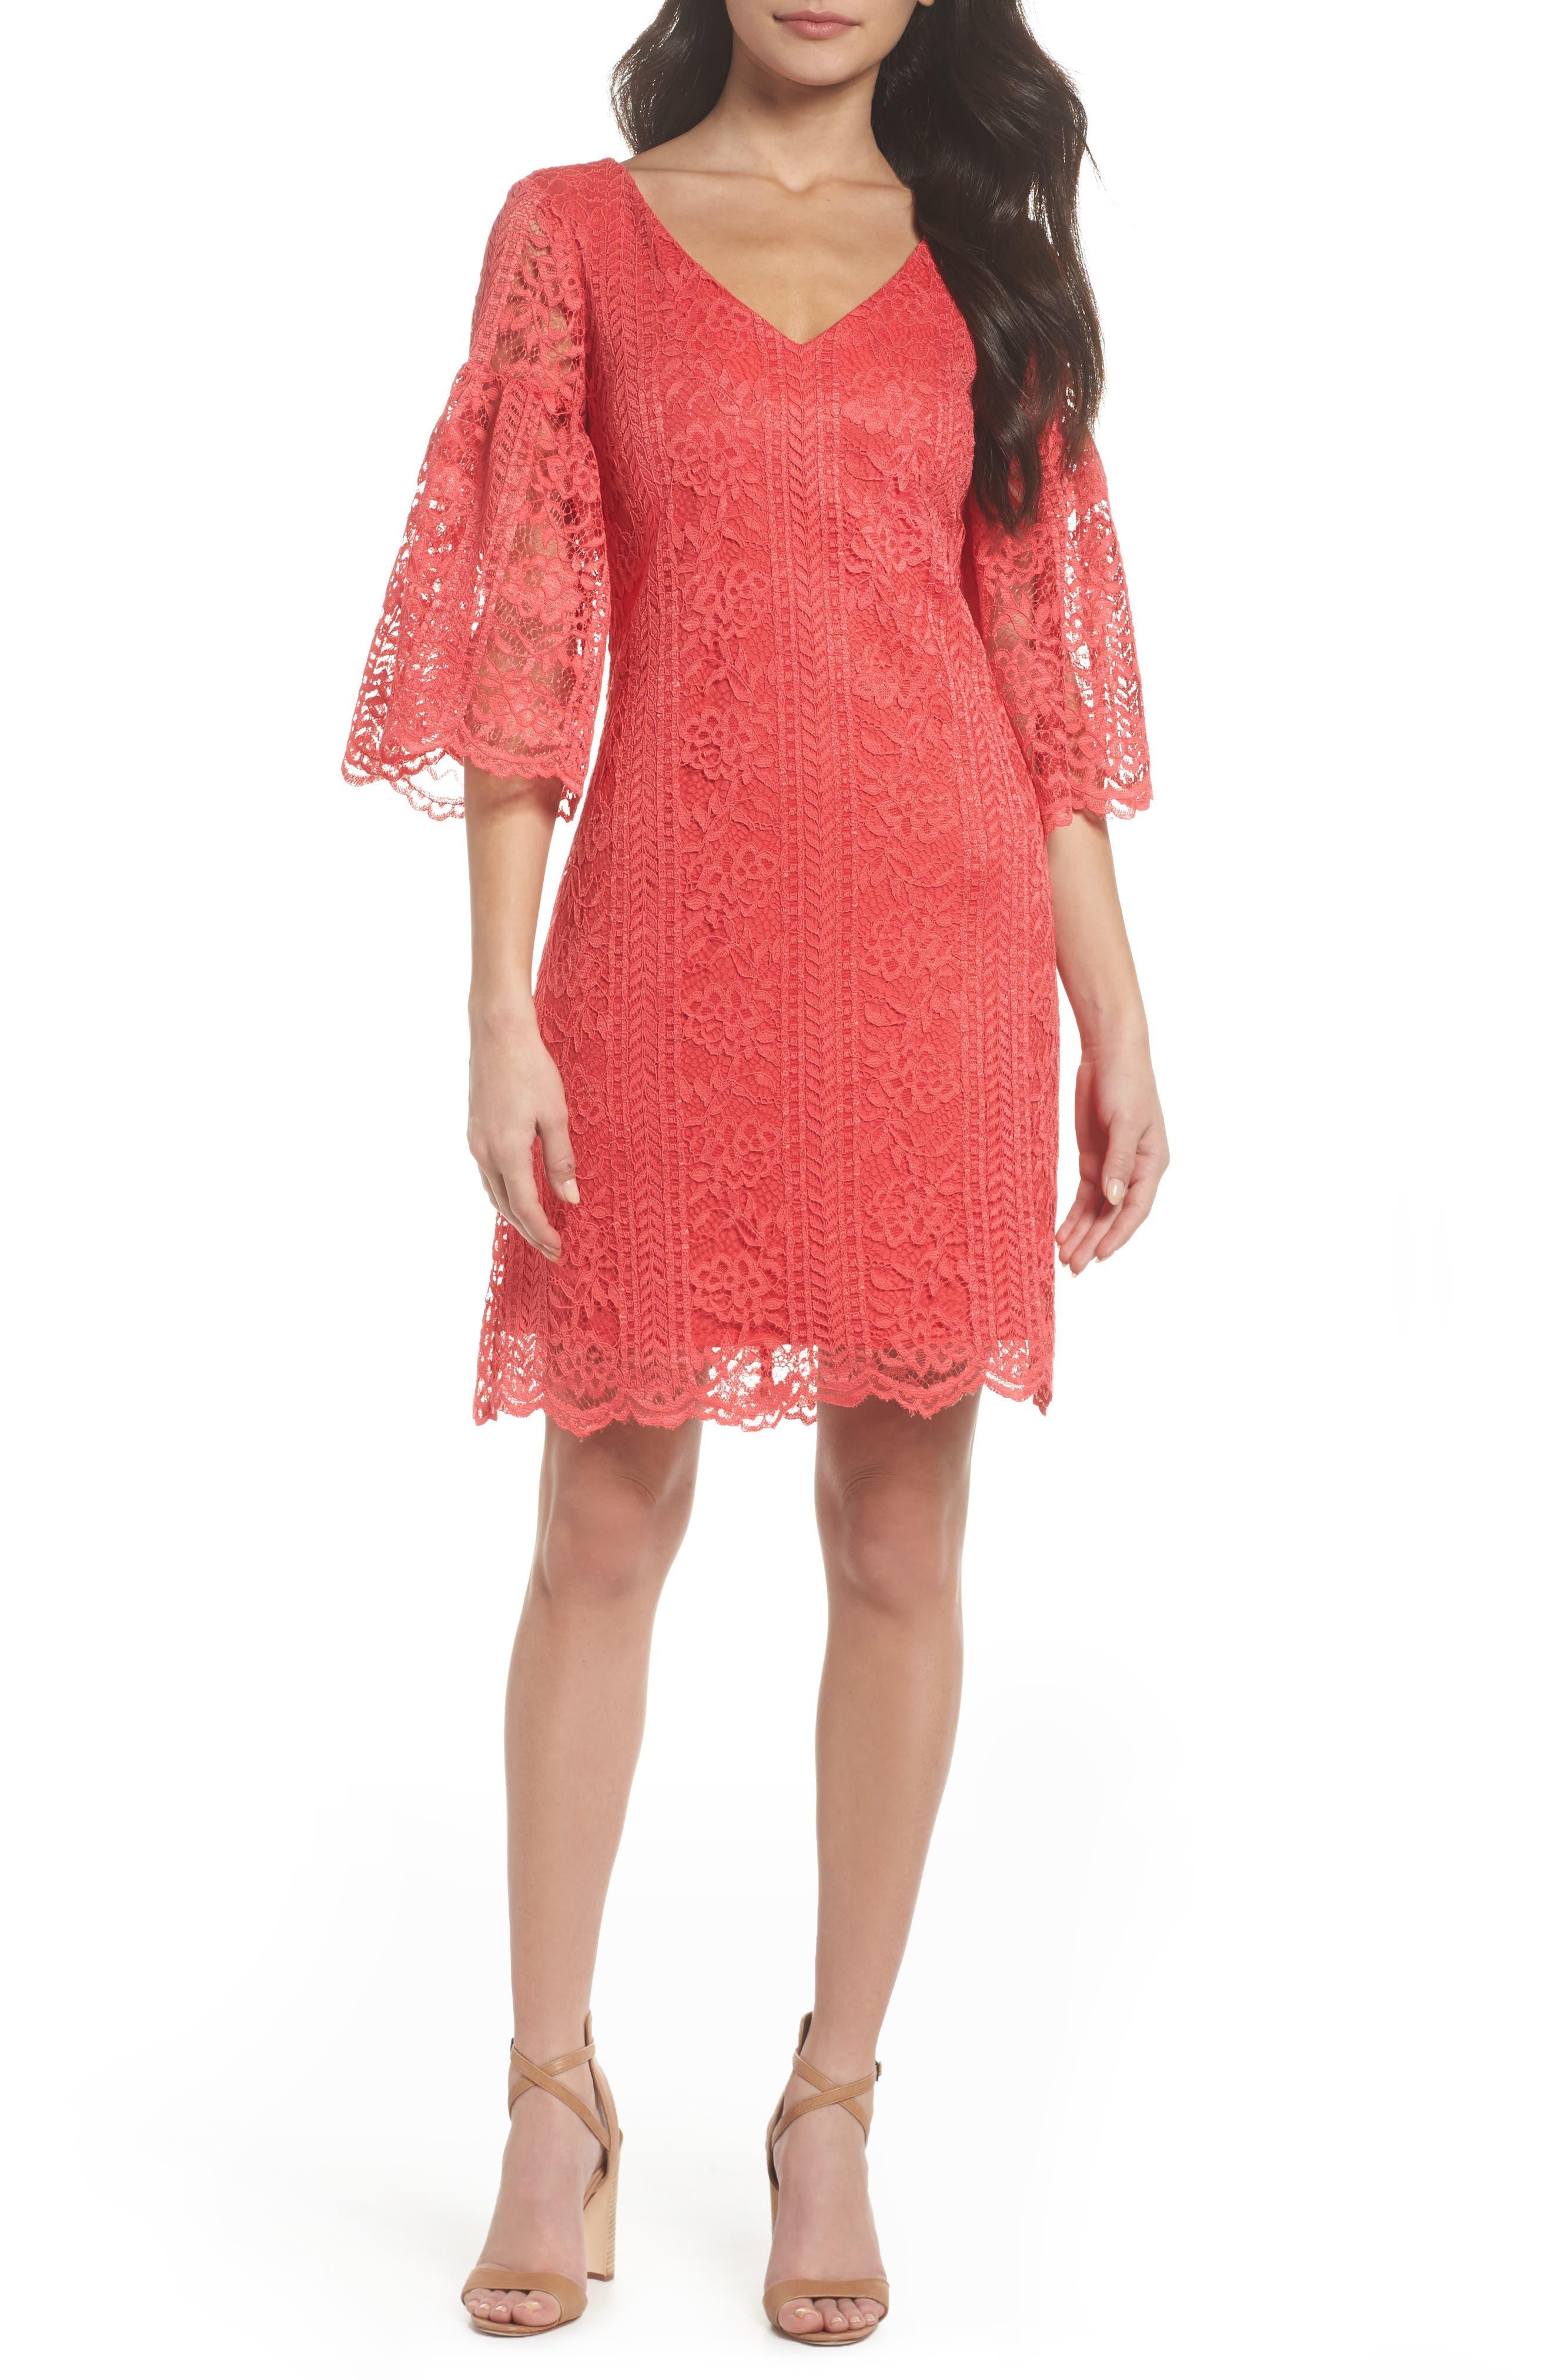 Gabby Skye Lace Bell Sleeve Dress